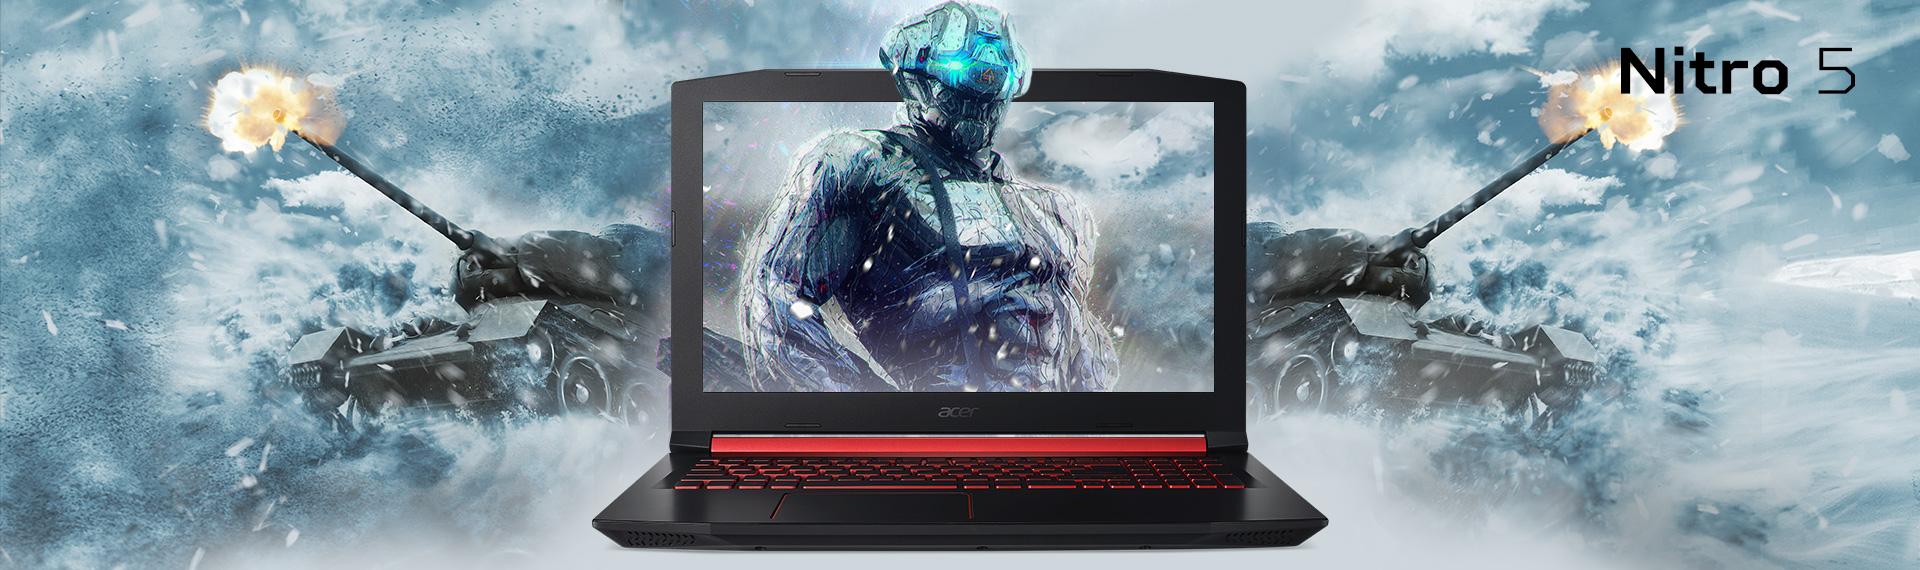 Laptop Nitro 5 Intel Core i5, Ideal untuk Gamer Casual